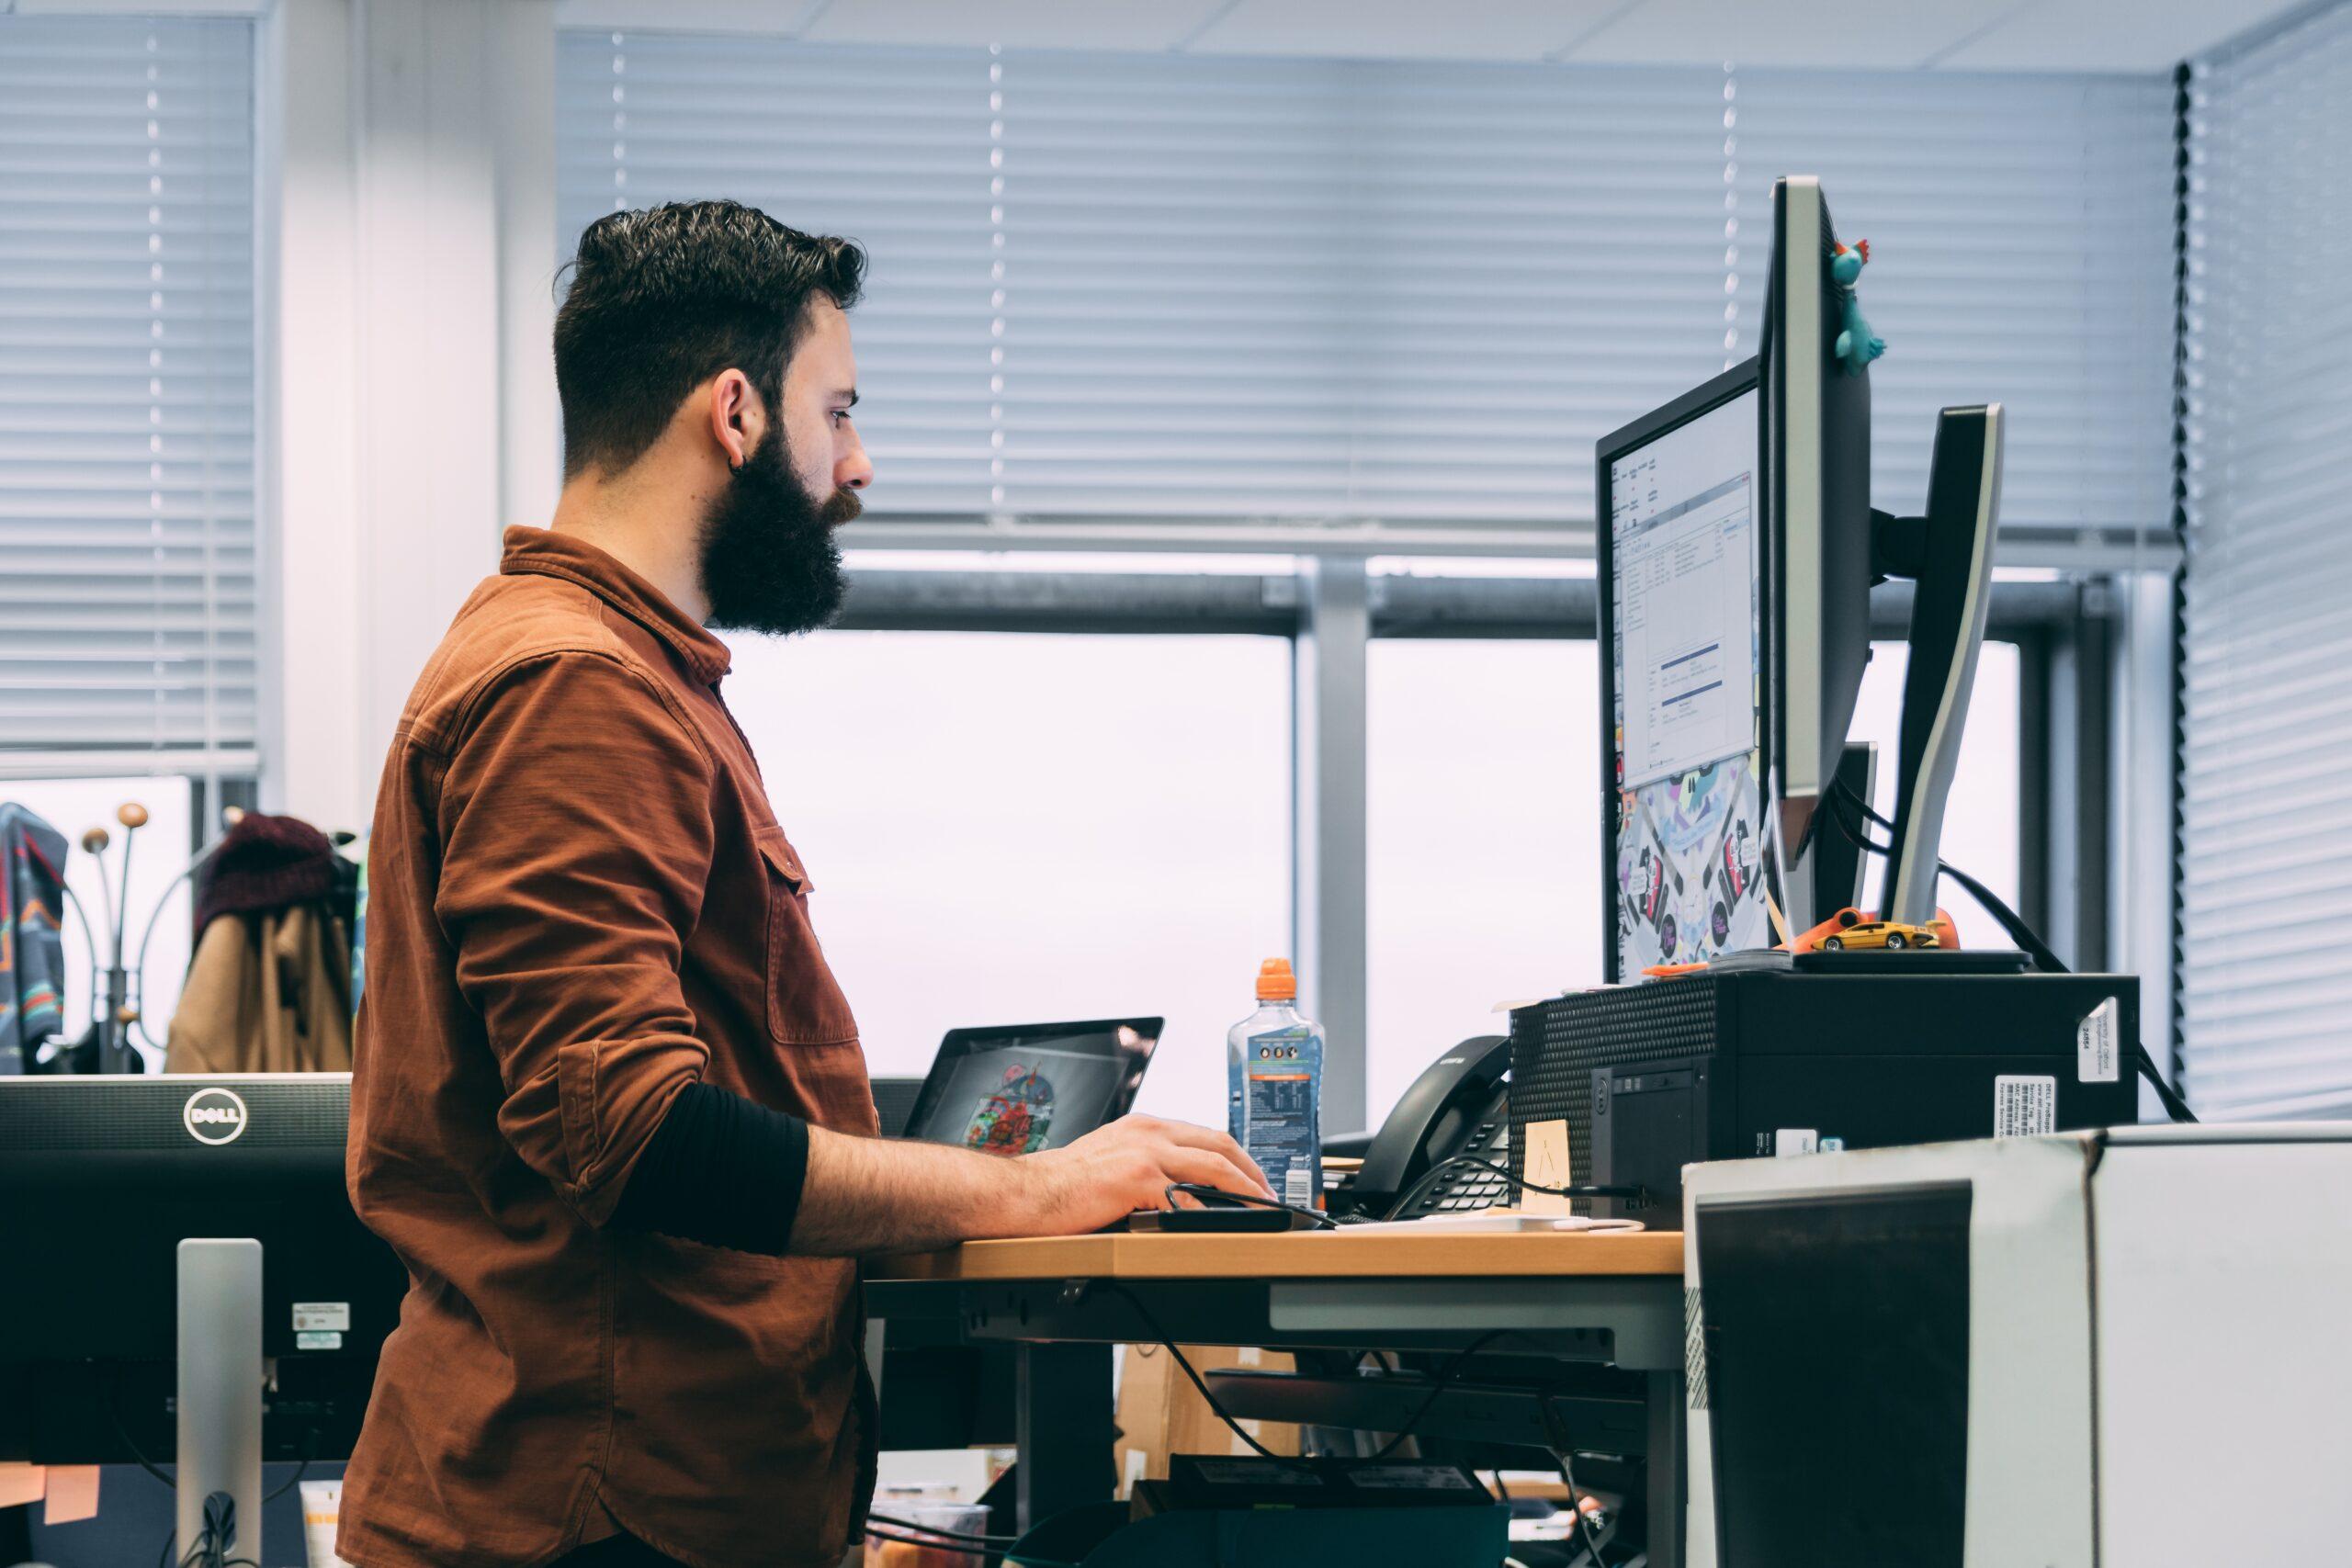 webseasoning.com - Digital Marketer: A Good Career Choice